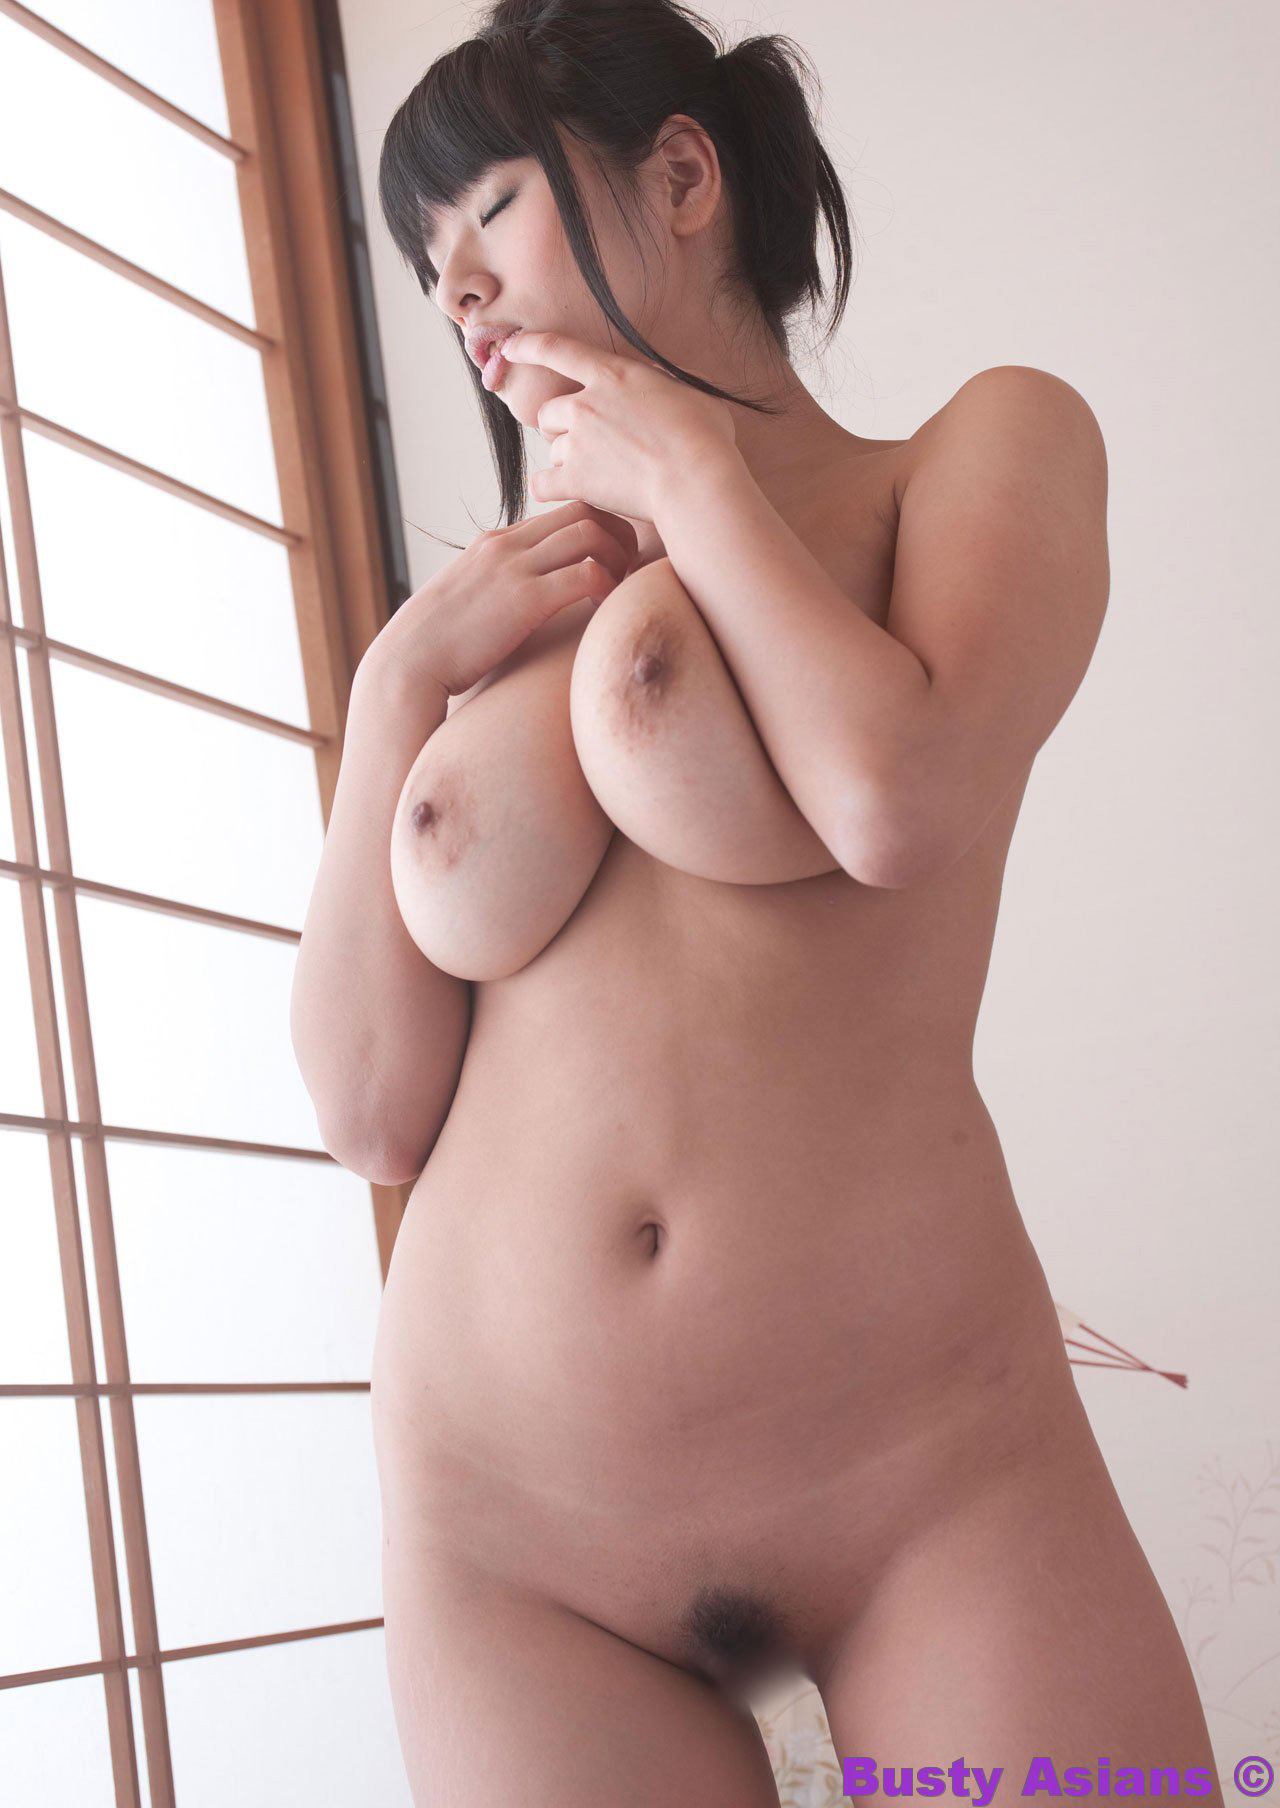 Shoko takasaki maid - 2 8